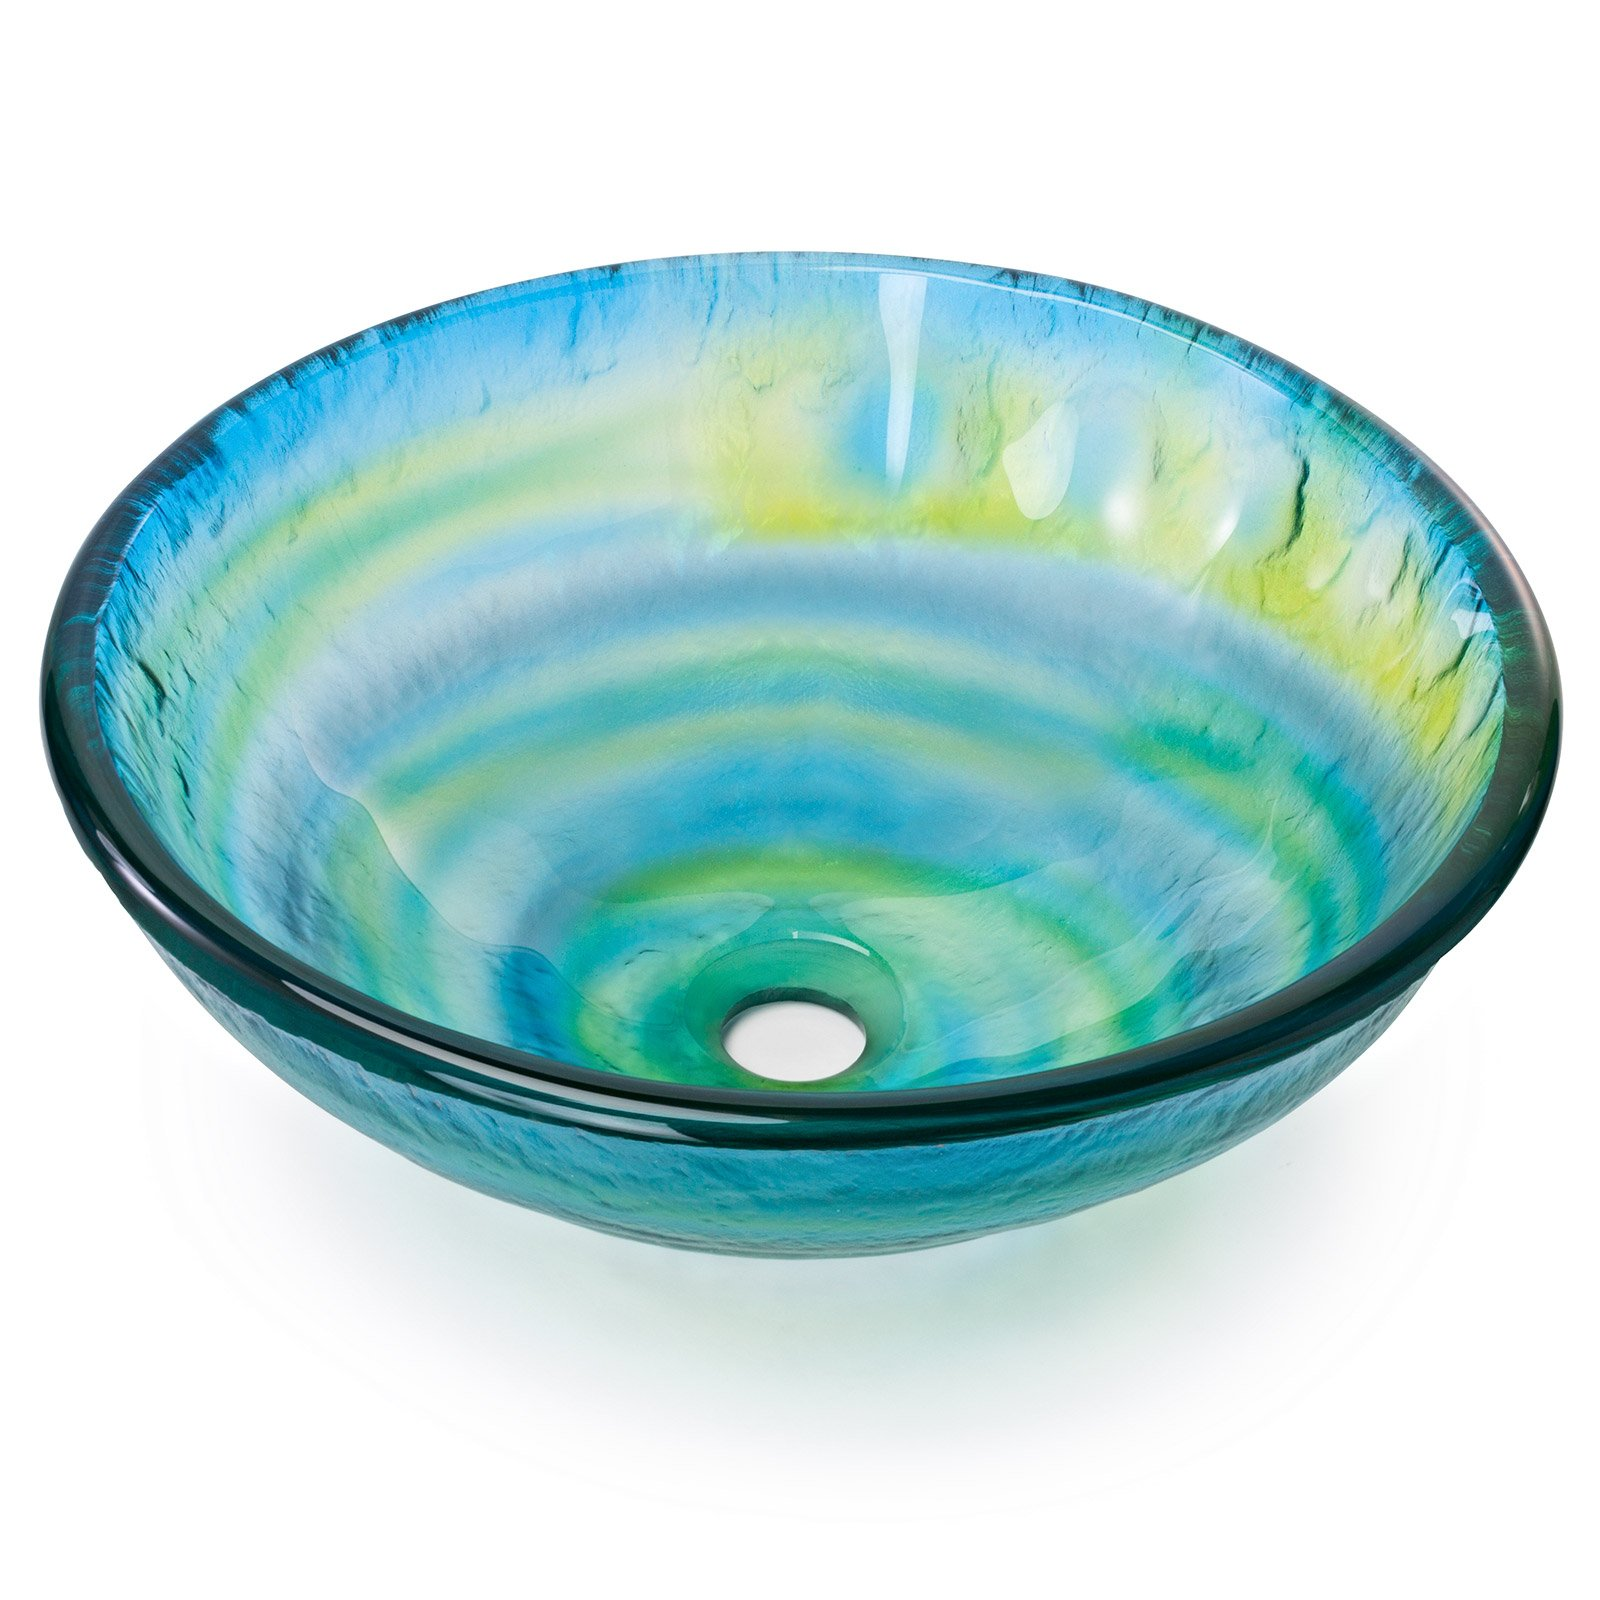 Miligoré Modern Glass Vessel Sink - Above Counter Bathroom Vanity Basin Bowl - Round Blue & Green